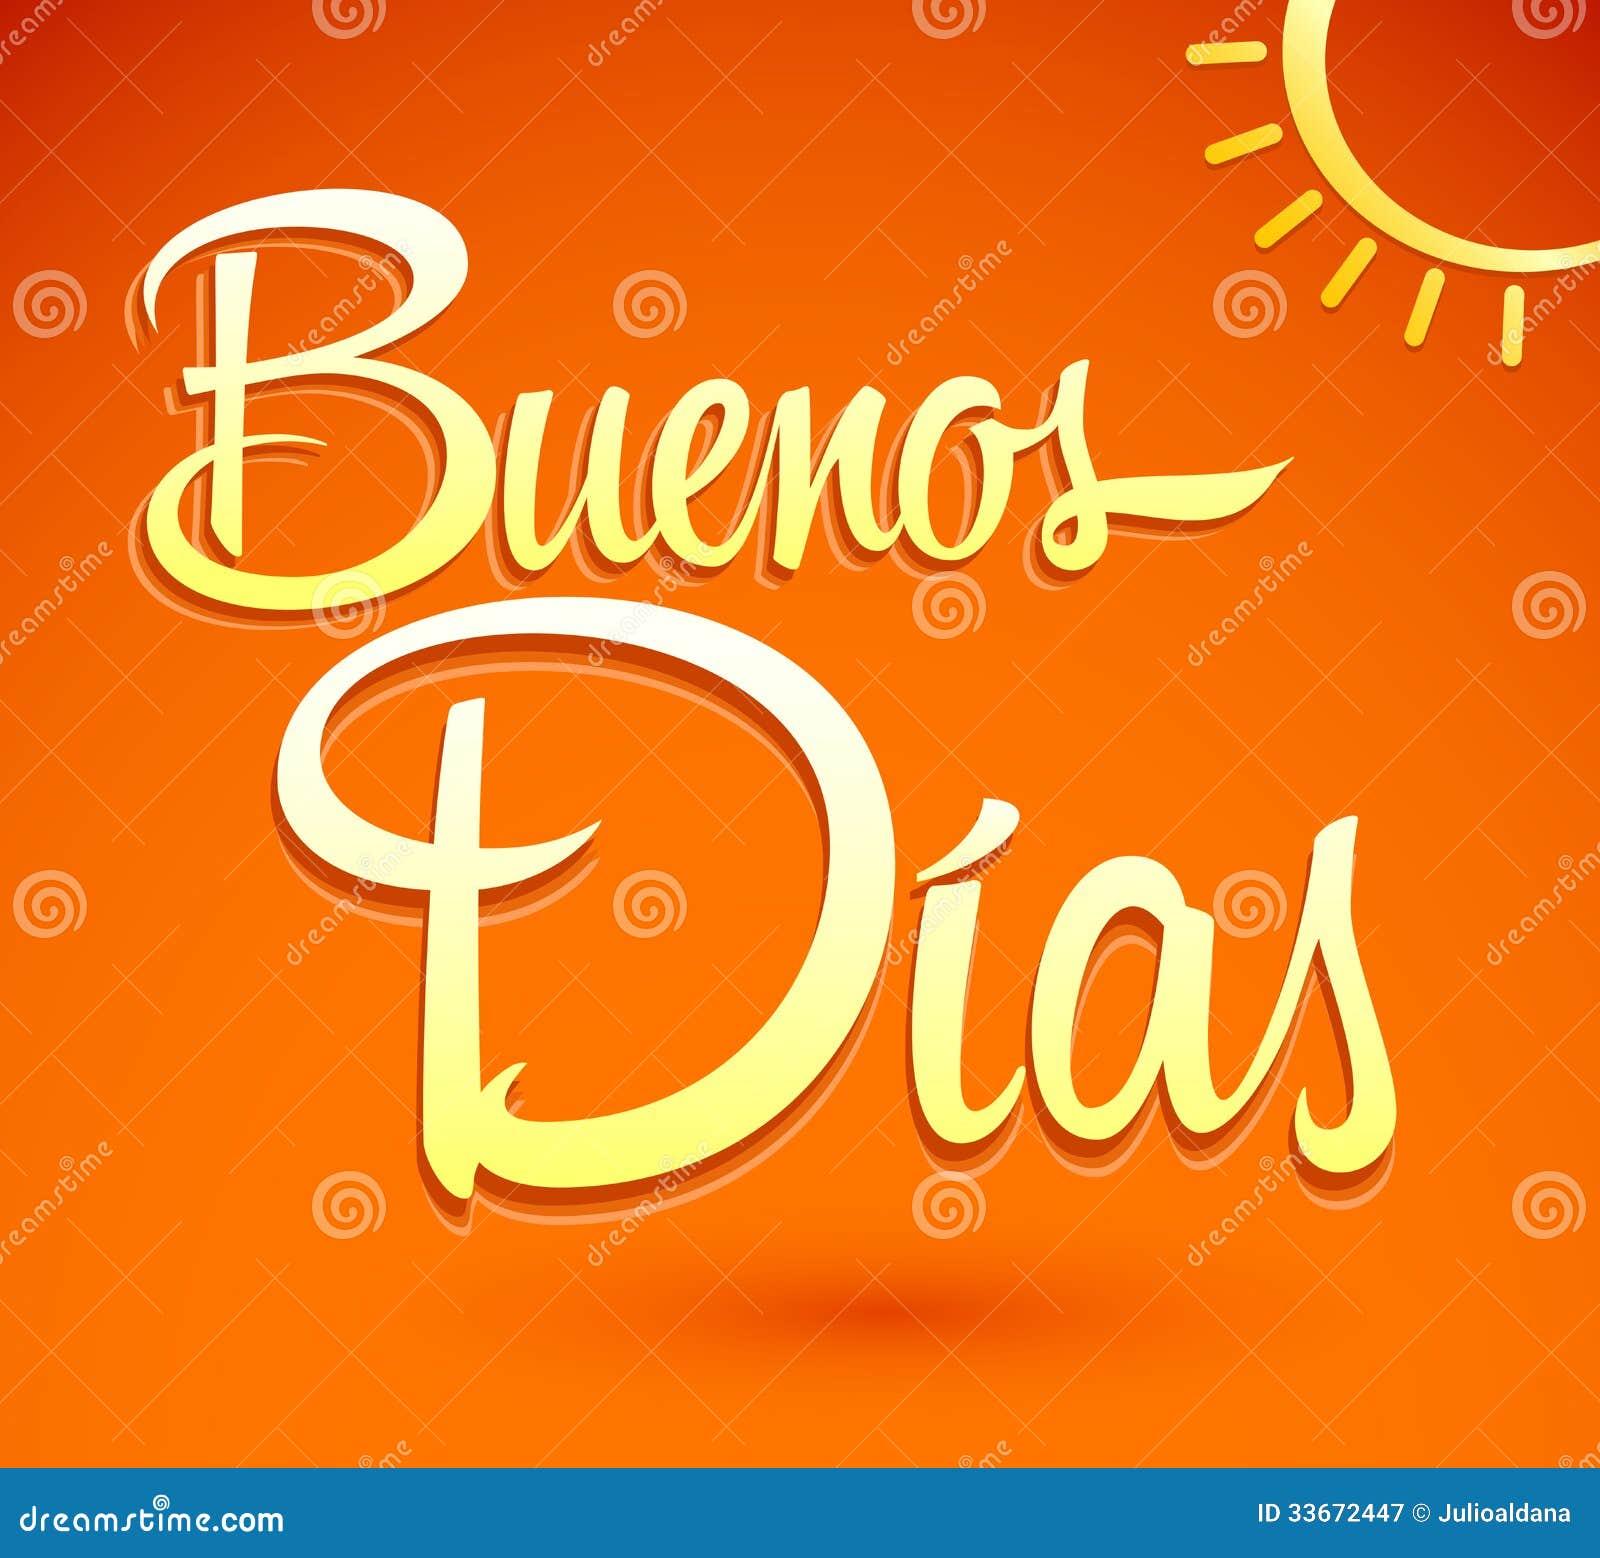 Good Morning Home In Spanish : Buenos dias goedemorgen het spaanse tekst van letters